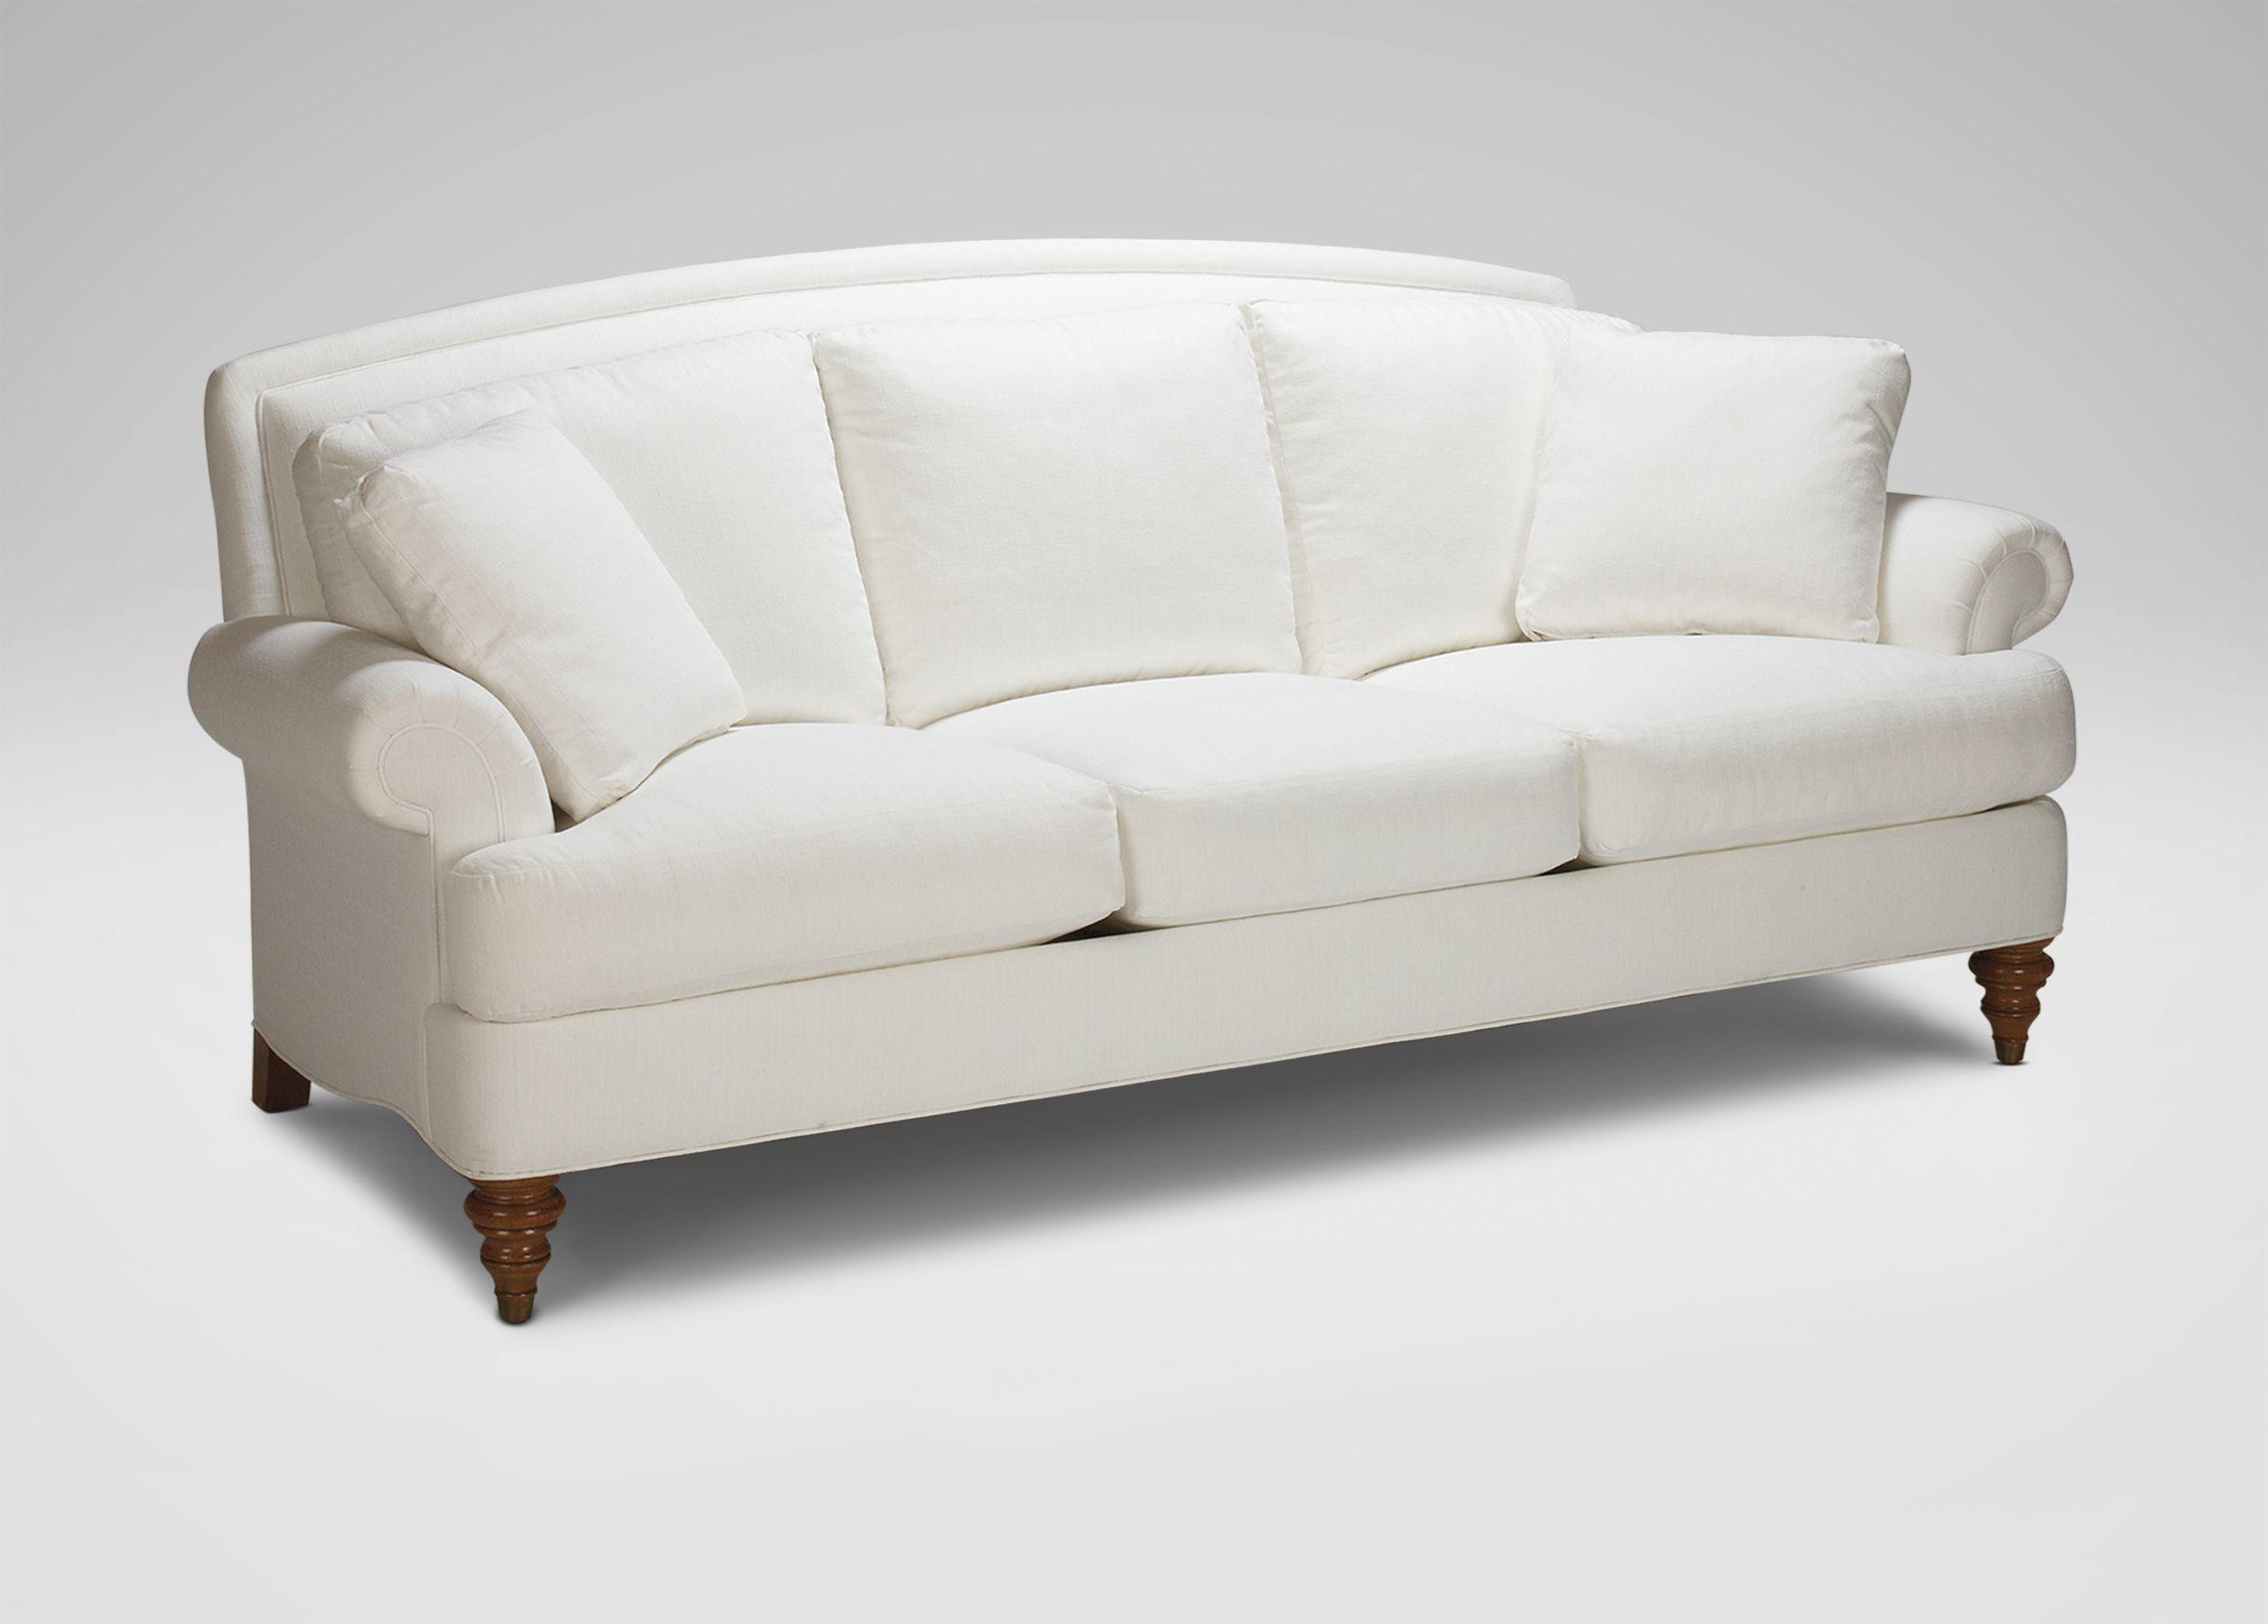 Ethan allen sofas living room hyde three cushion sofa ethan allen